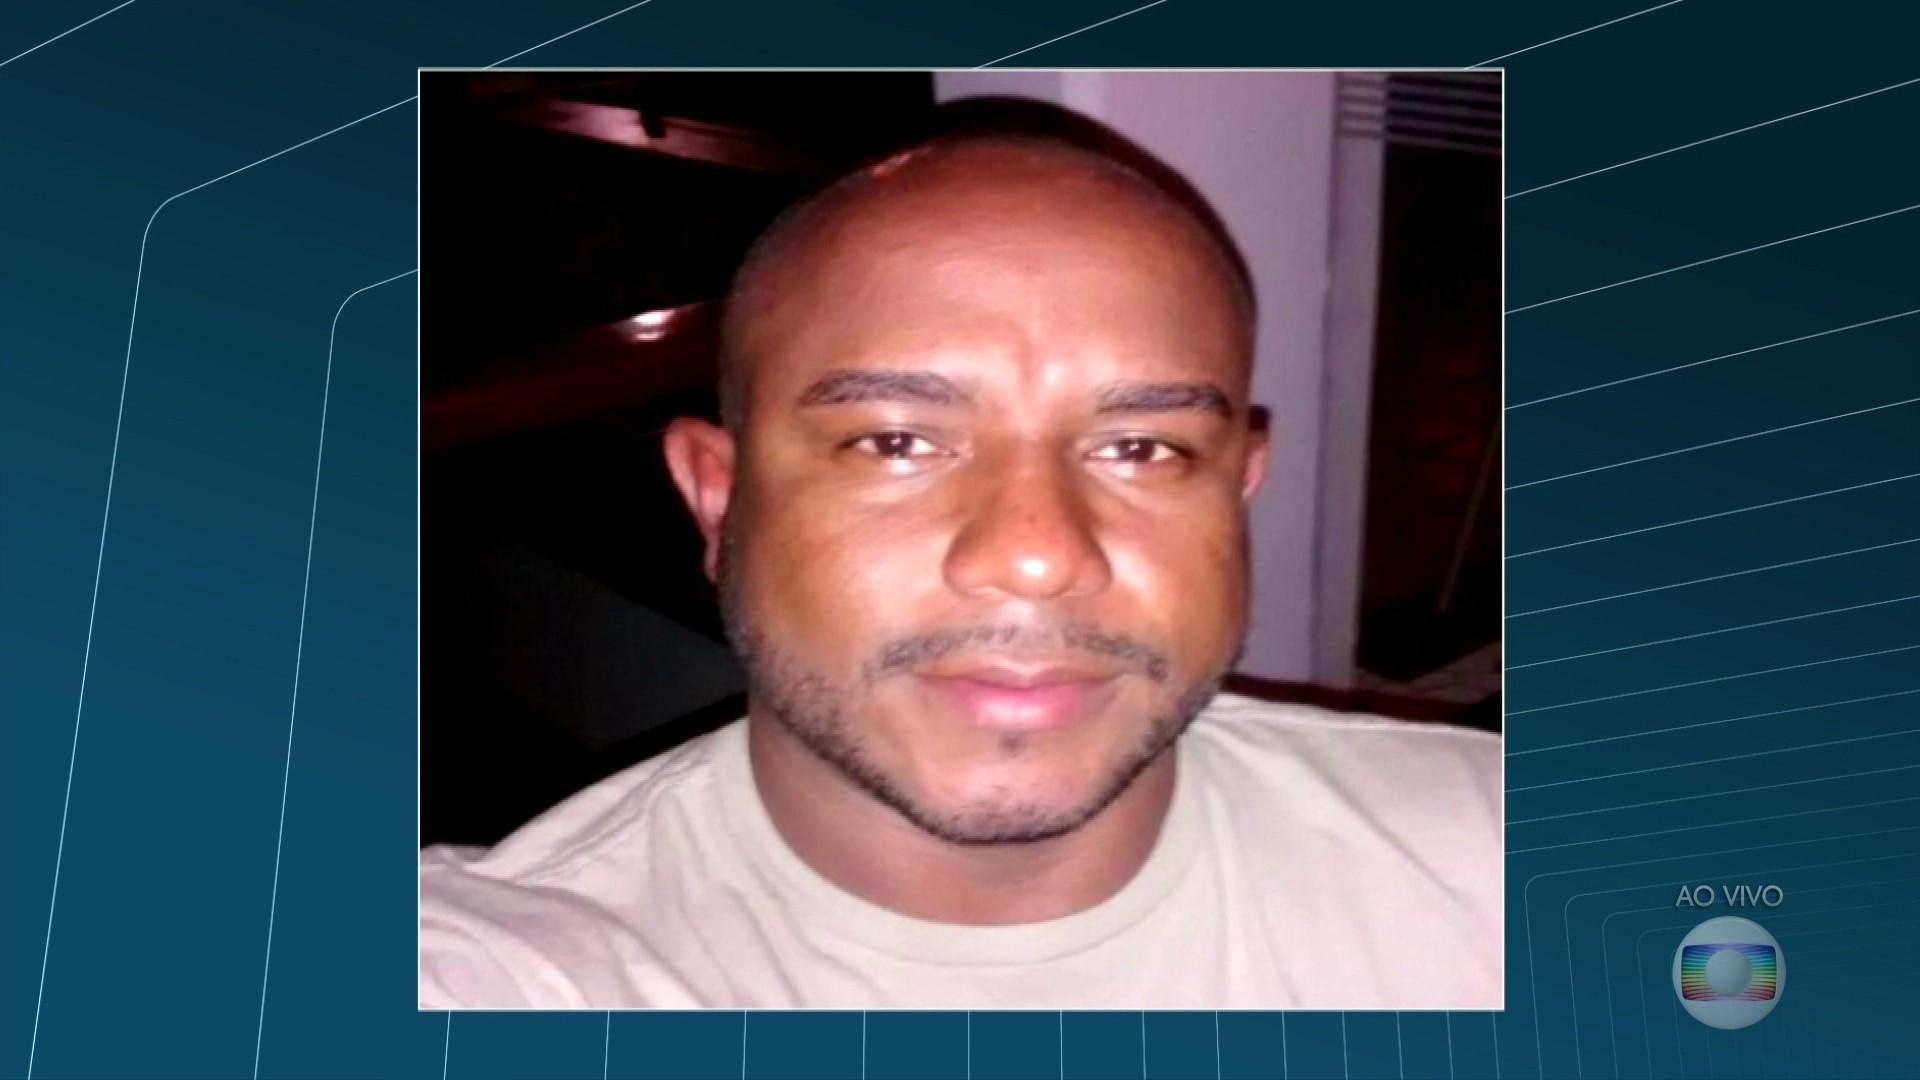 PM é assassinado na Baixada Fluminense (Tomaz Silva/Agência Brasil)